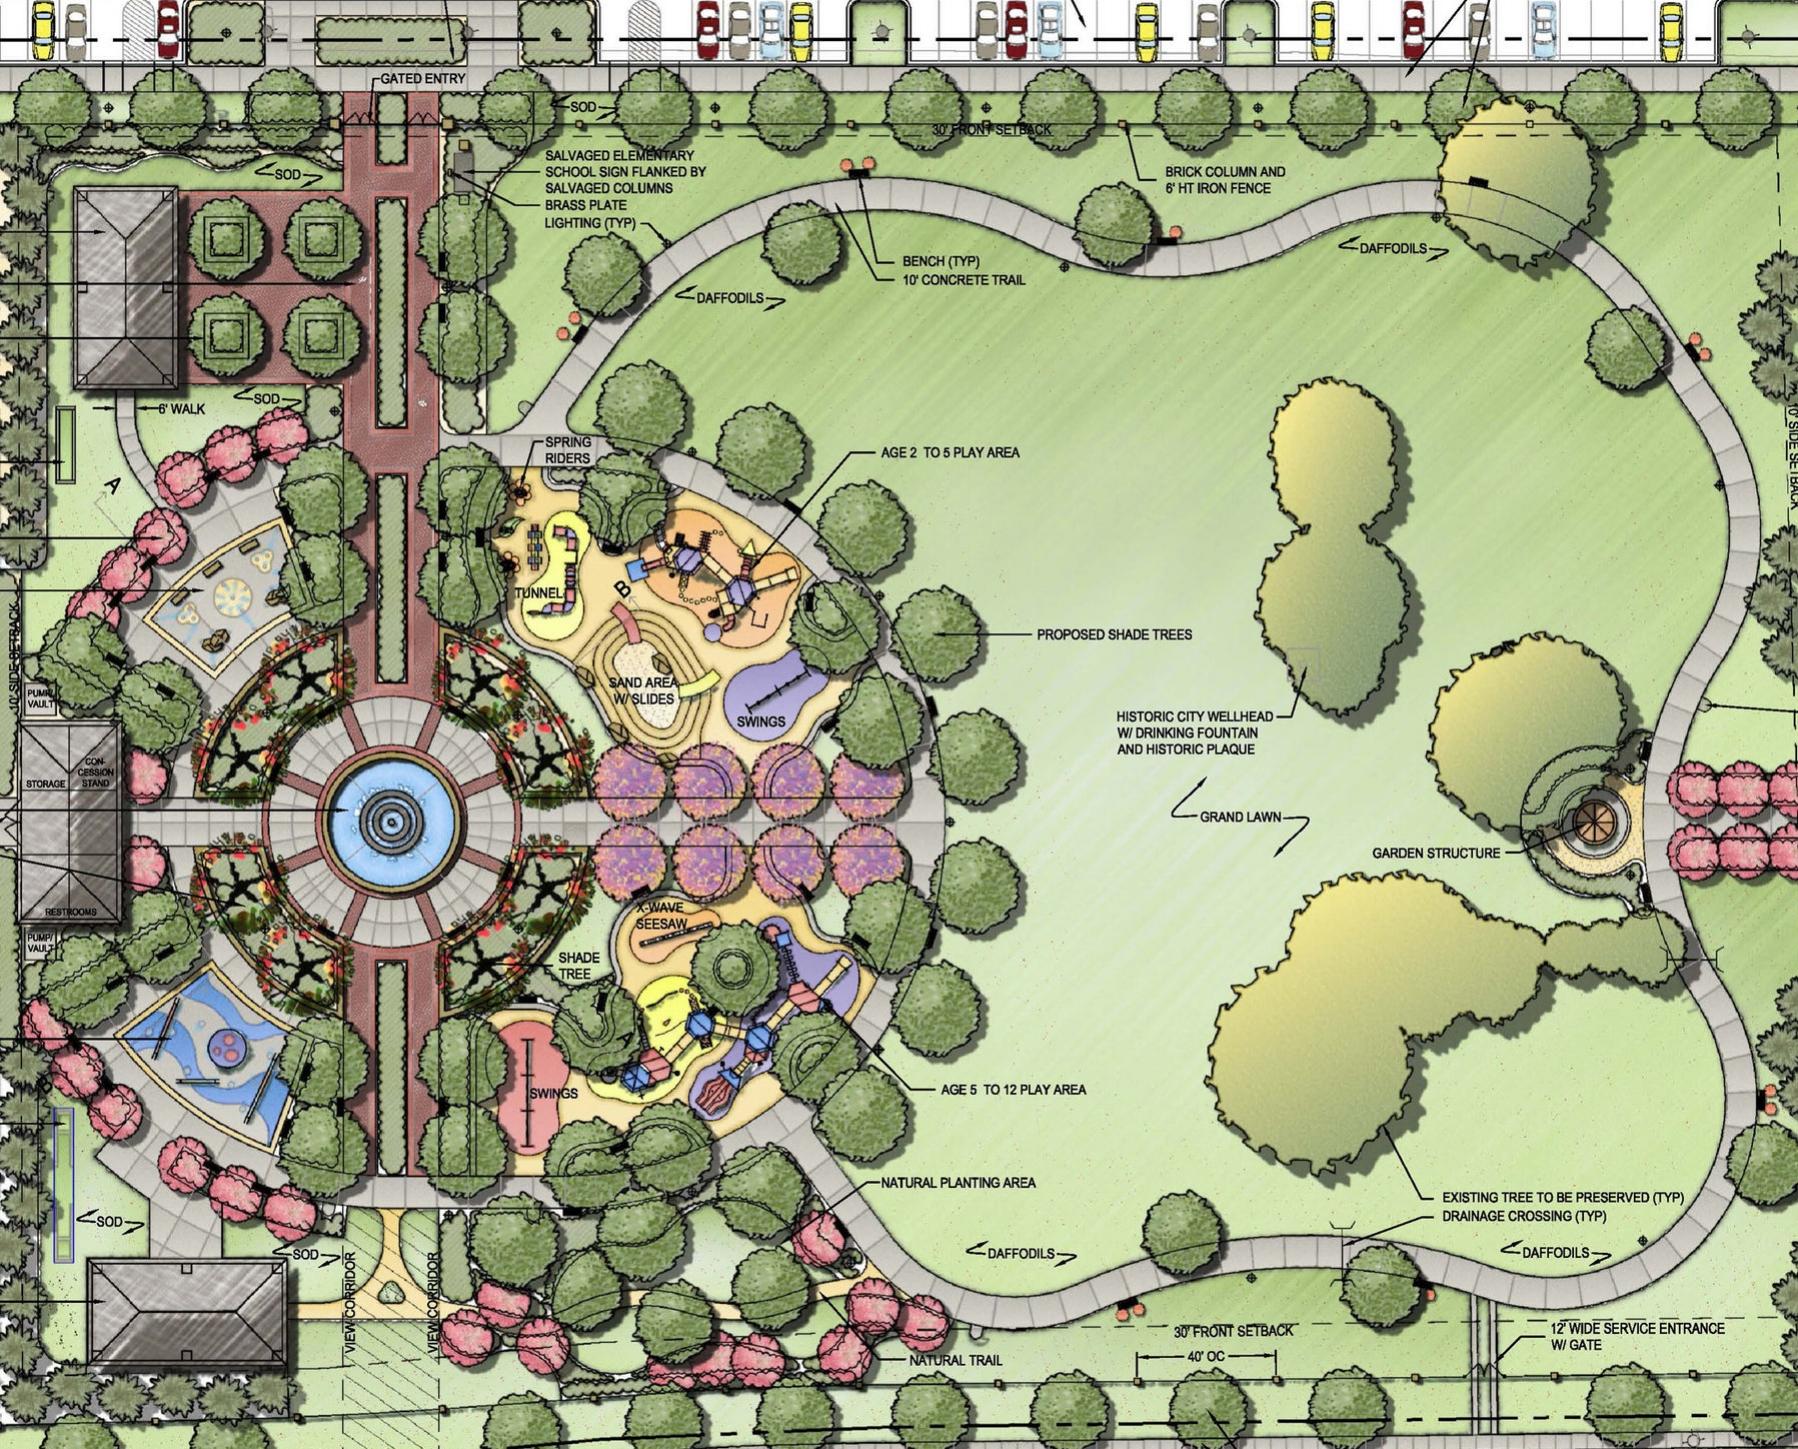 Tennessee Street Park Master Plan